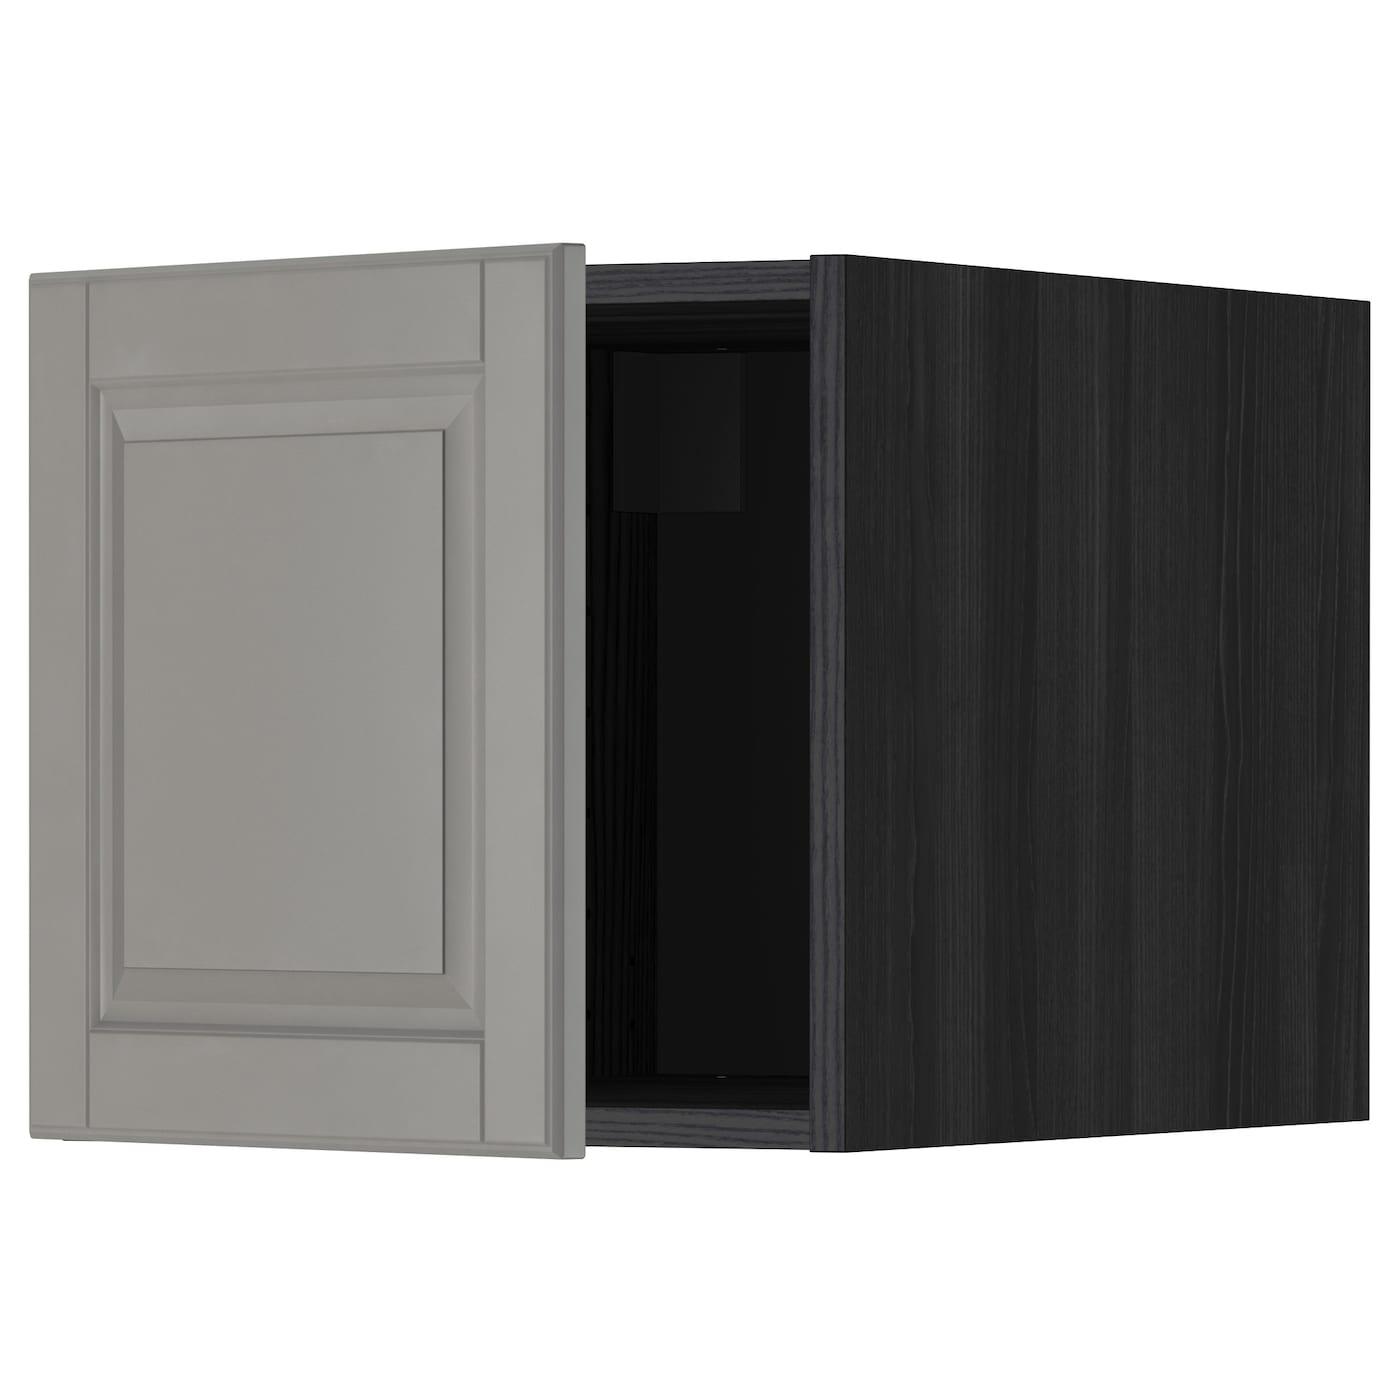 metod top cabinet black bodbyn grey 40x40 cm ikea. Black Bedroom Furniture Sets. Home Design Ideas